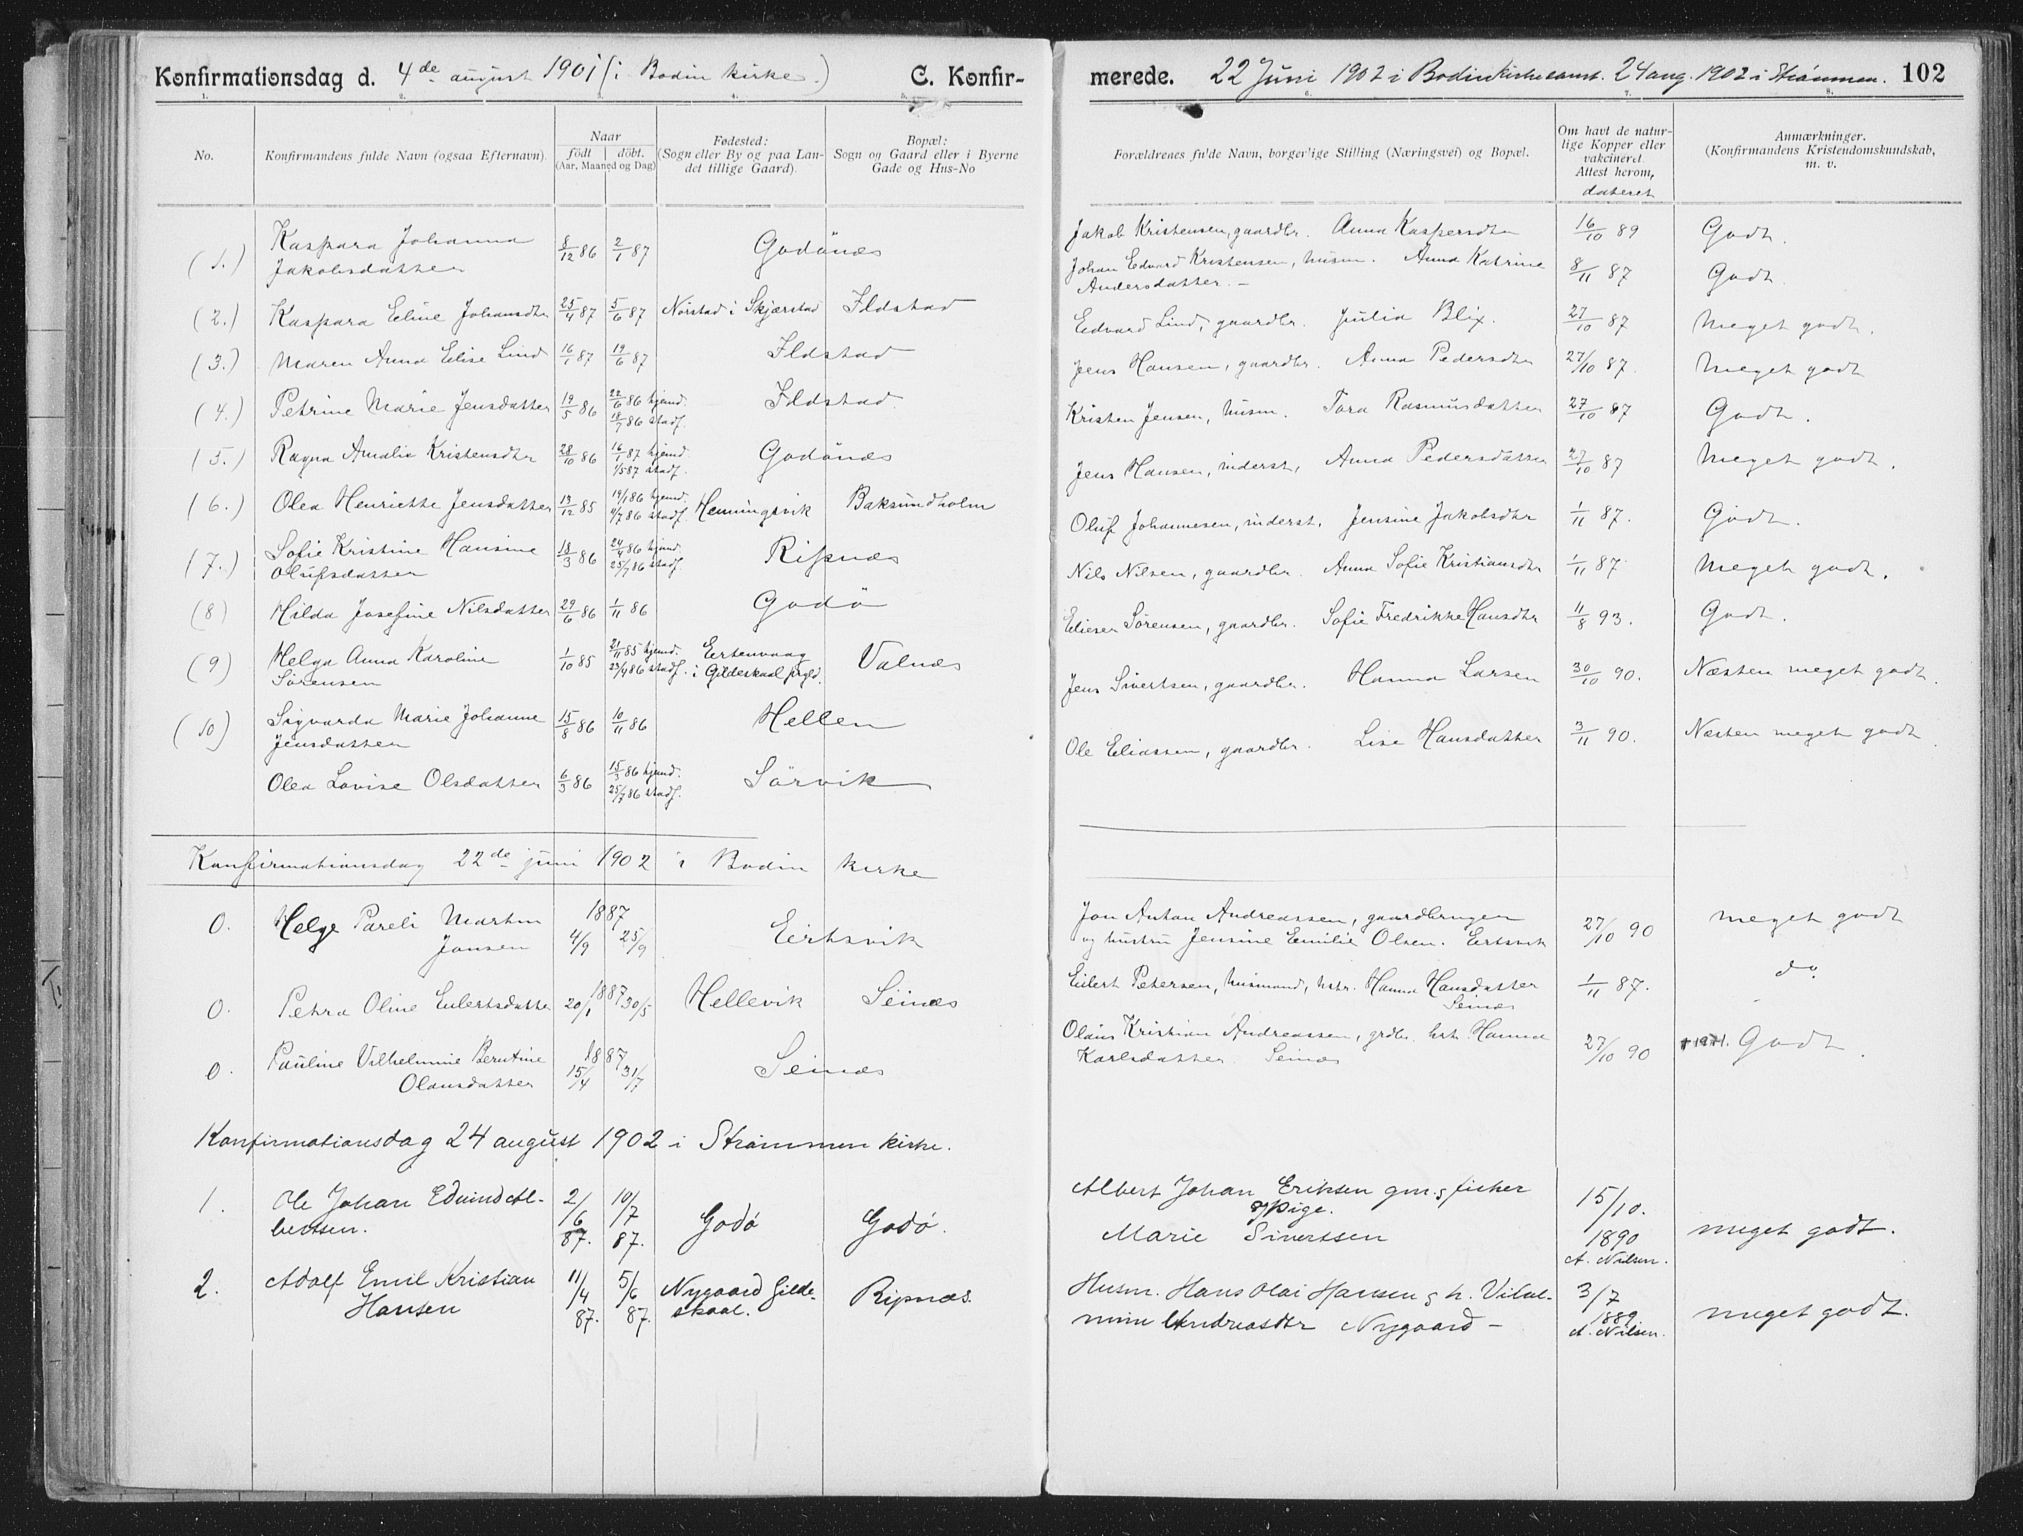 SAT, Ministerialprotokoller, klokkerbøker og fødselsregistre - Nordland, 804/L0081: Ministerialbok nr. 804A02, 1901-1915, s. 102